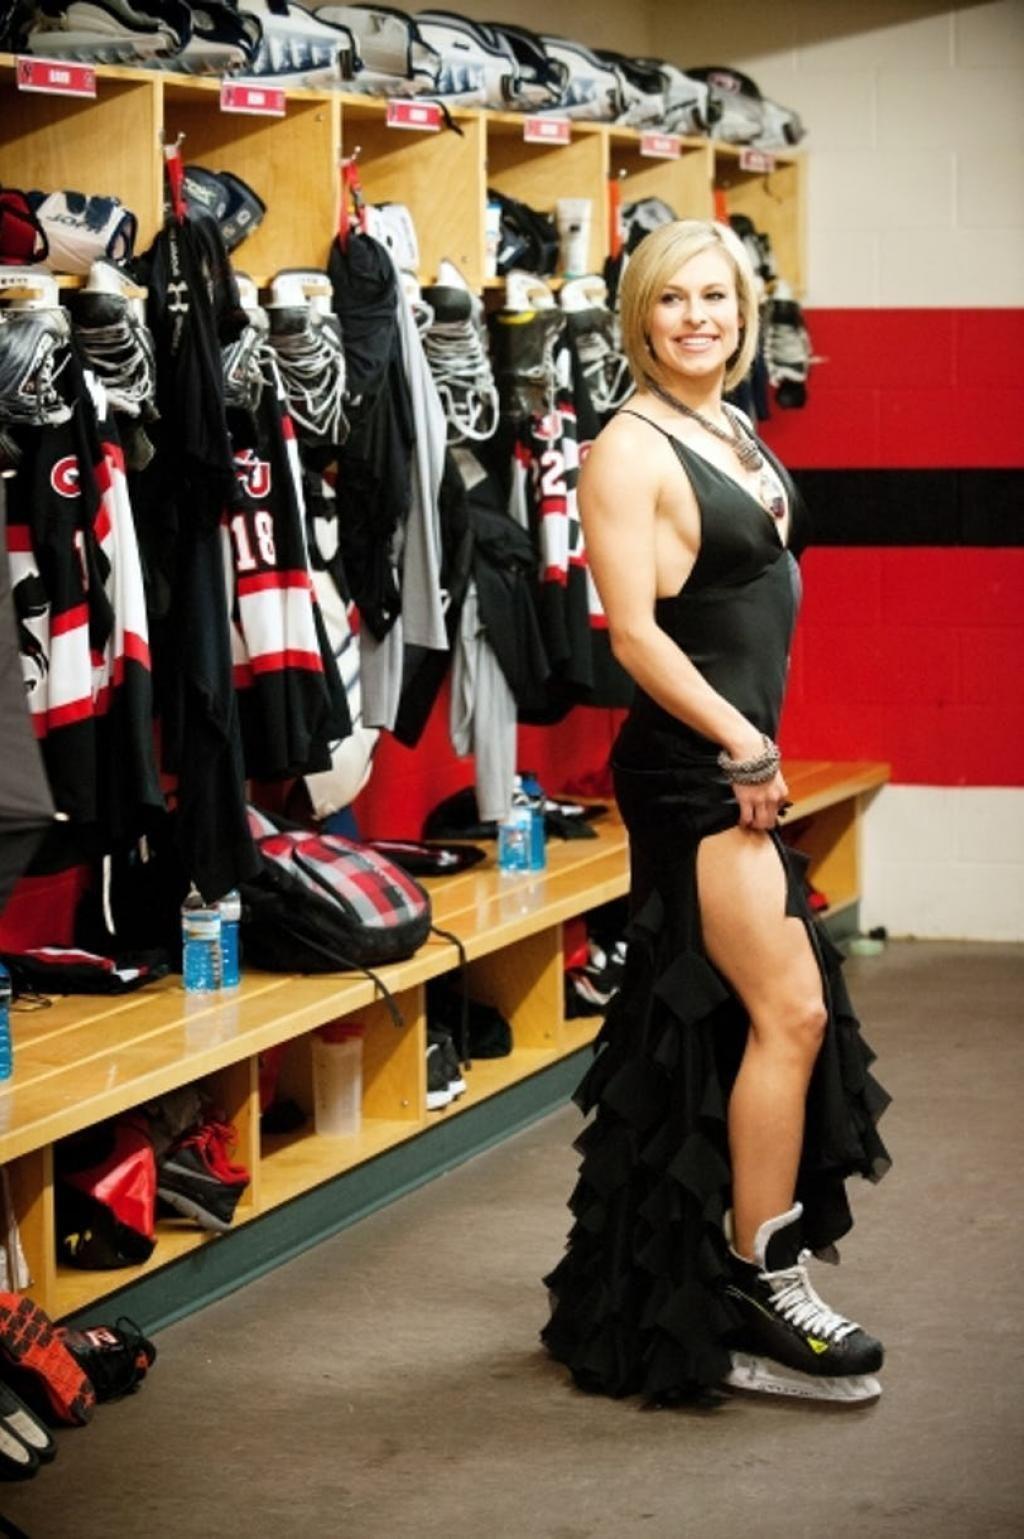 hot nude hockey players